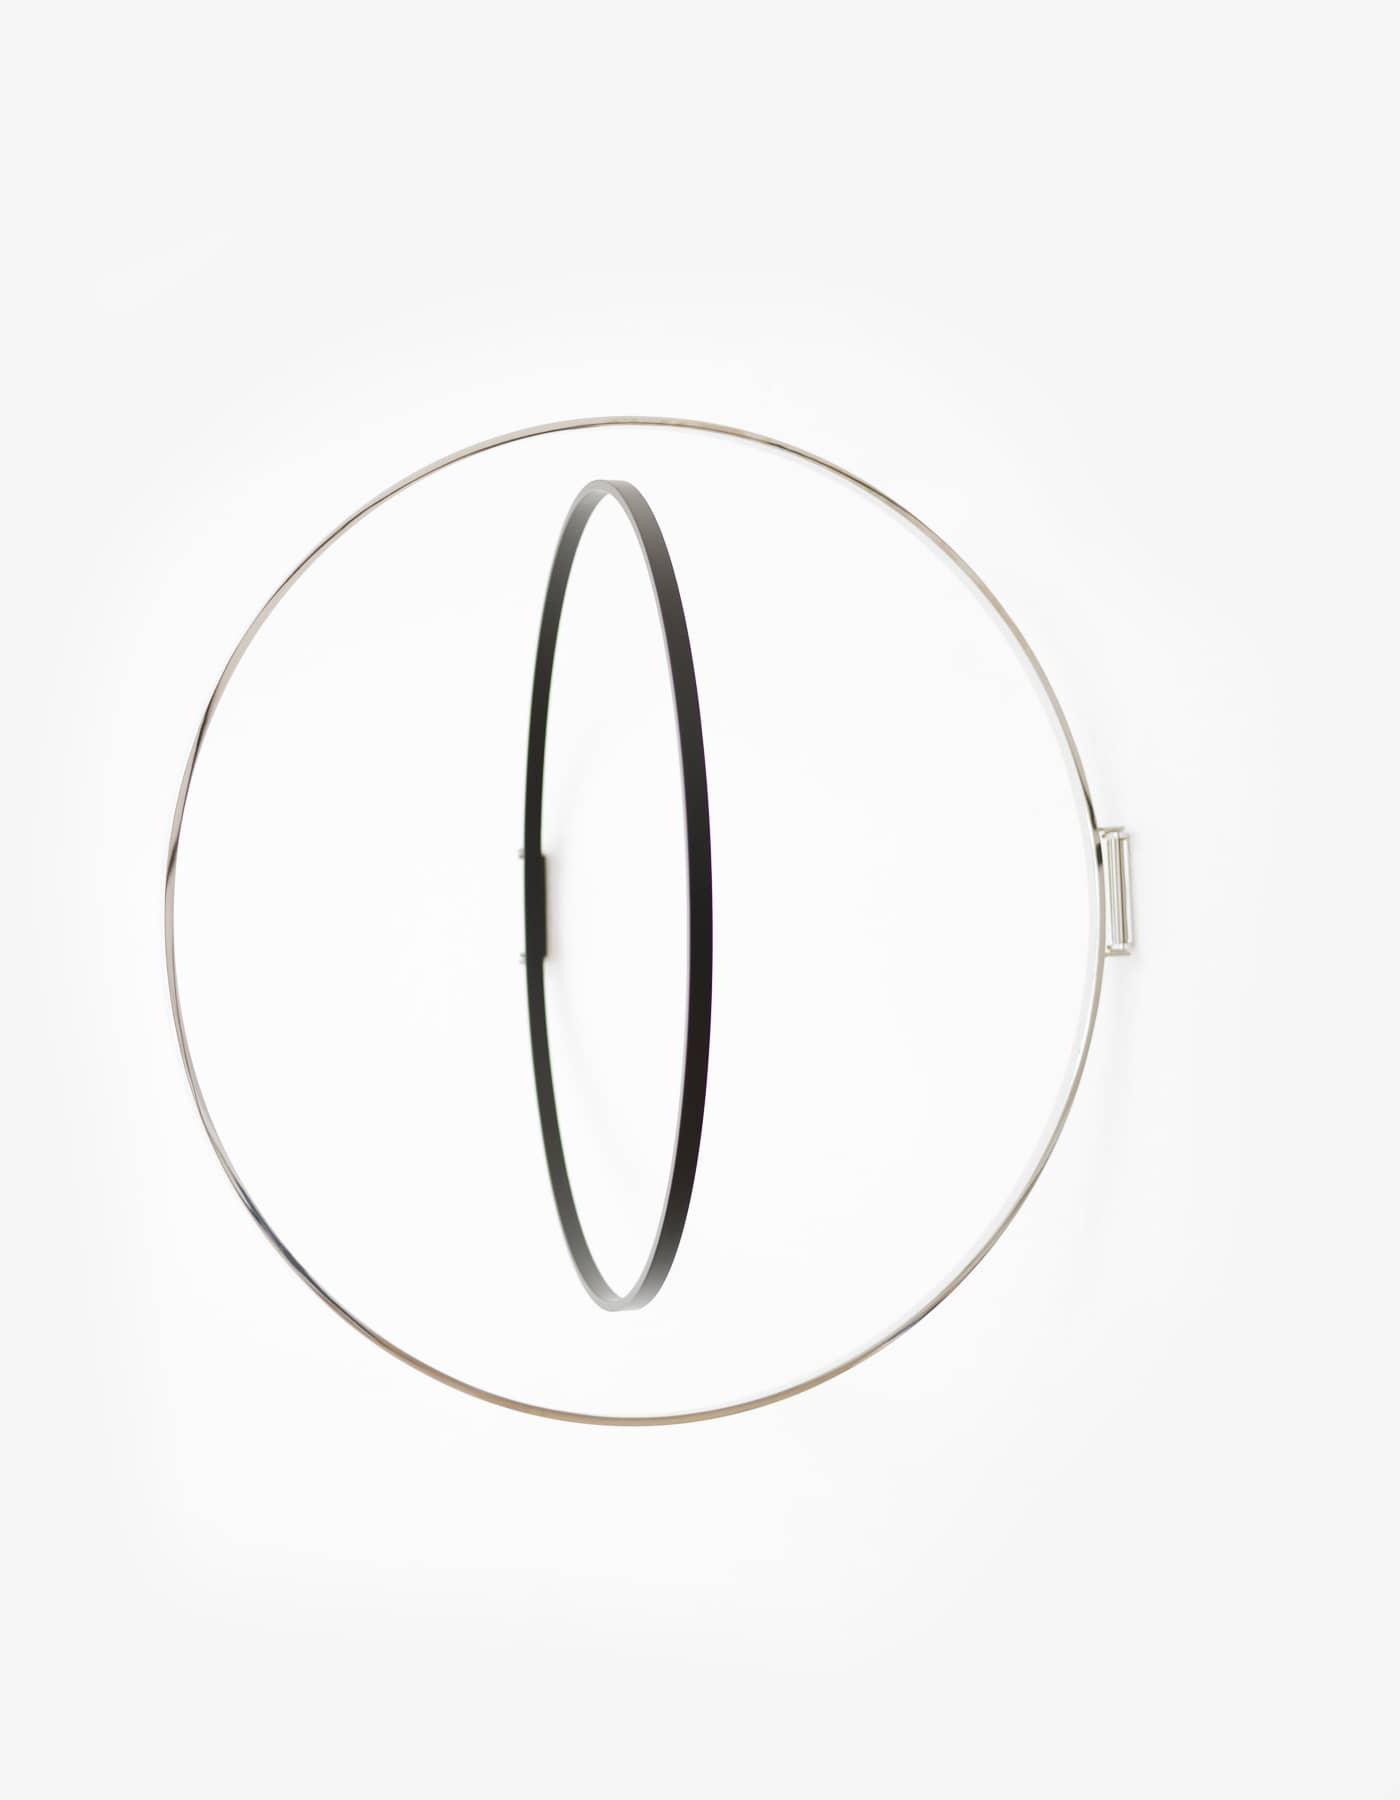 Ringe-Atelier haussmann-zascho petkow-garderobe- wandobjekt